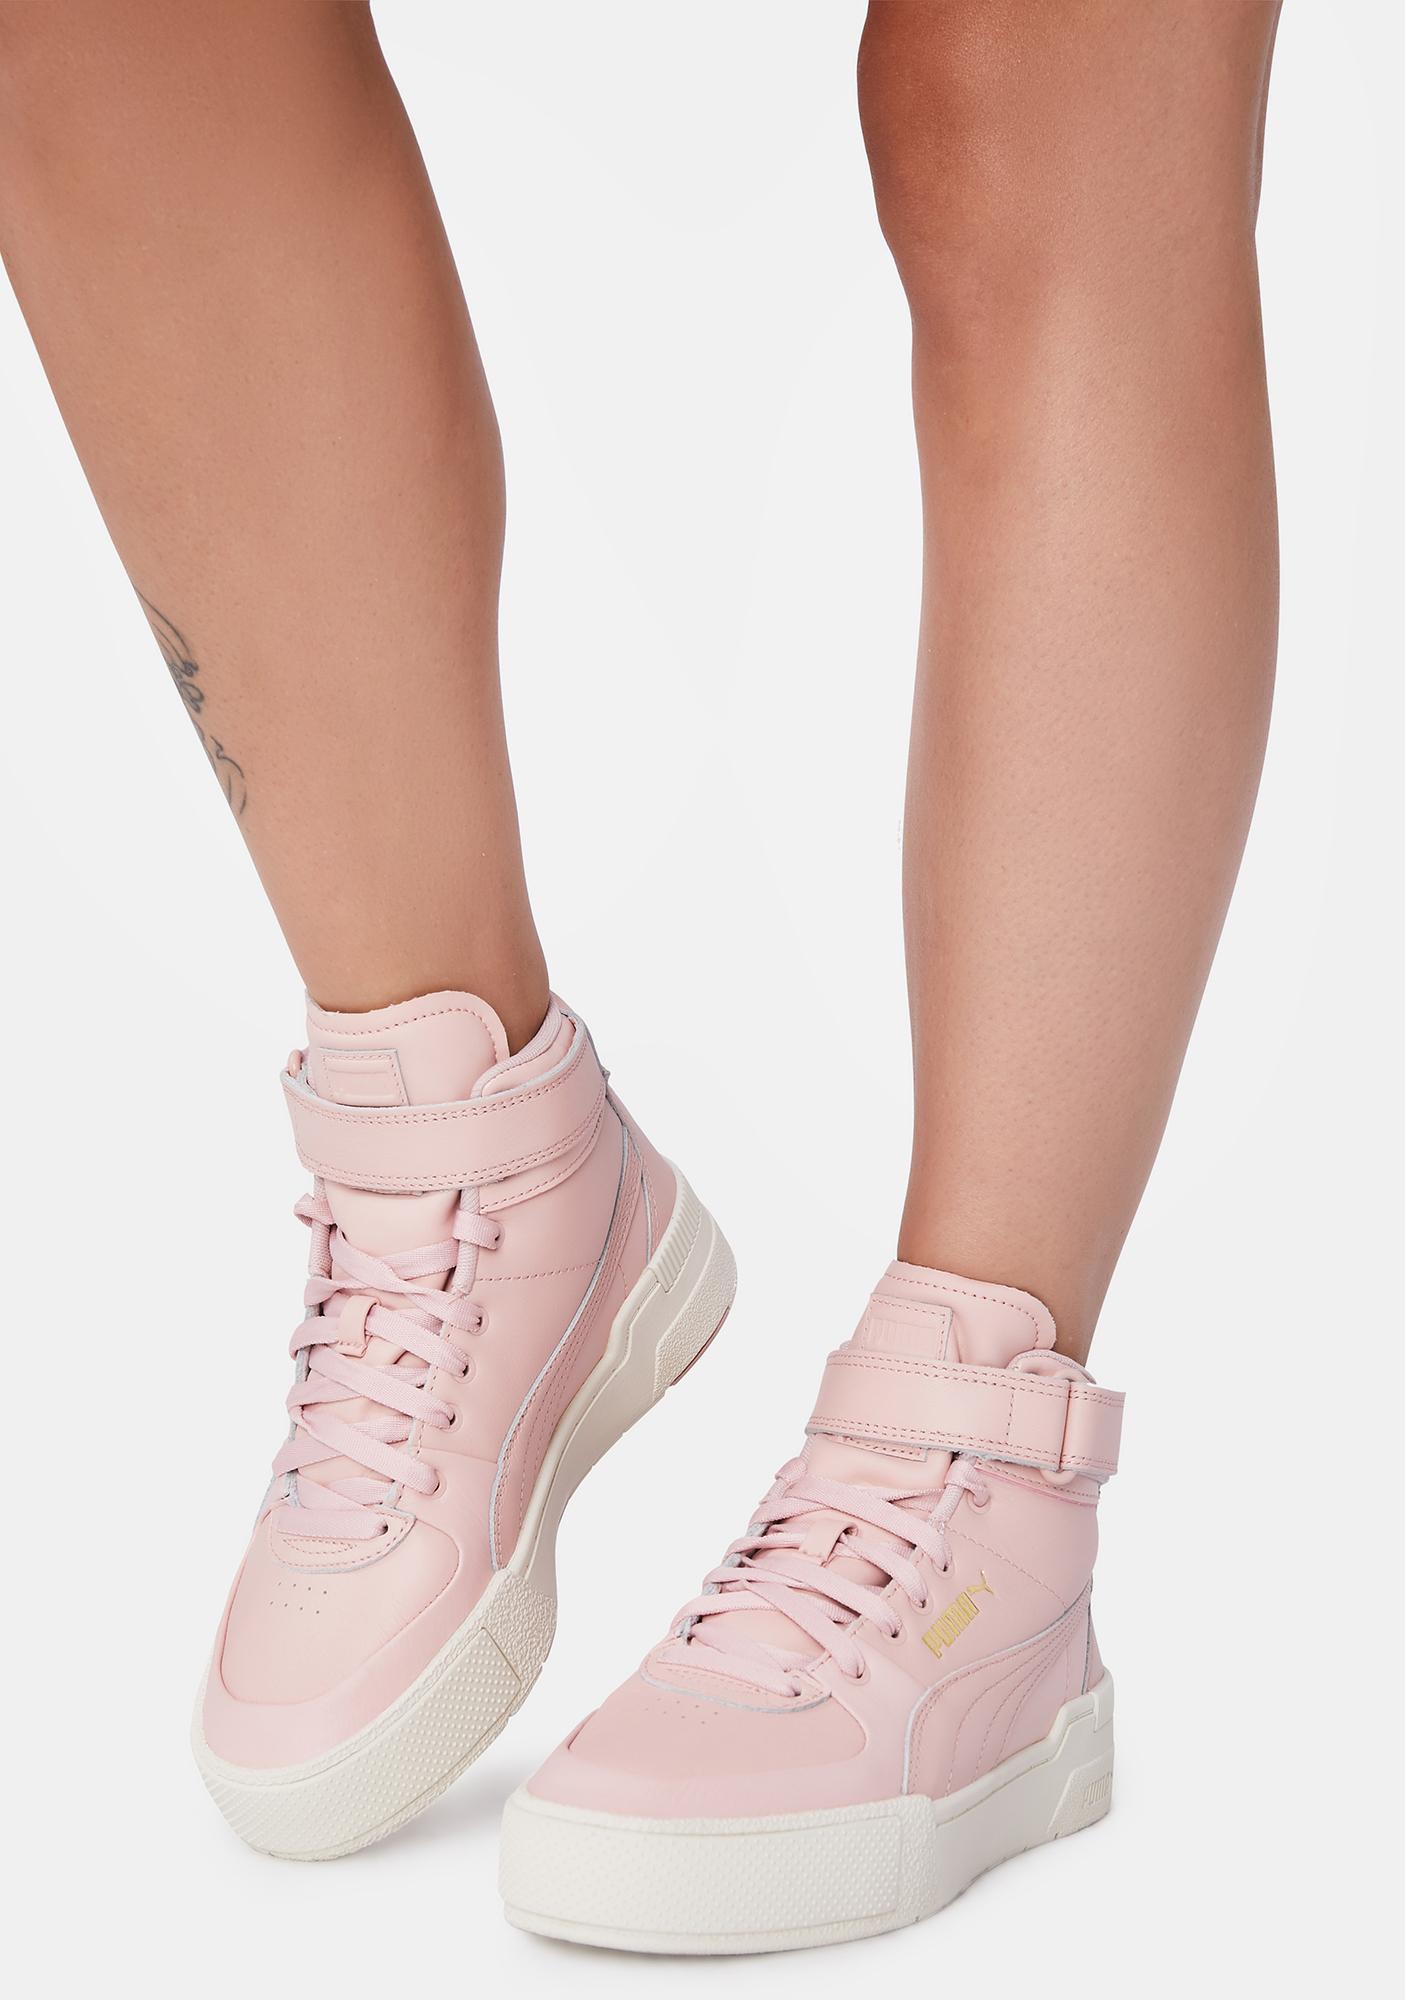 PUMA Pink Cali Sport Hi Top Sneakers